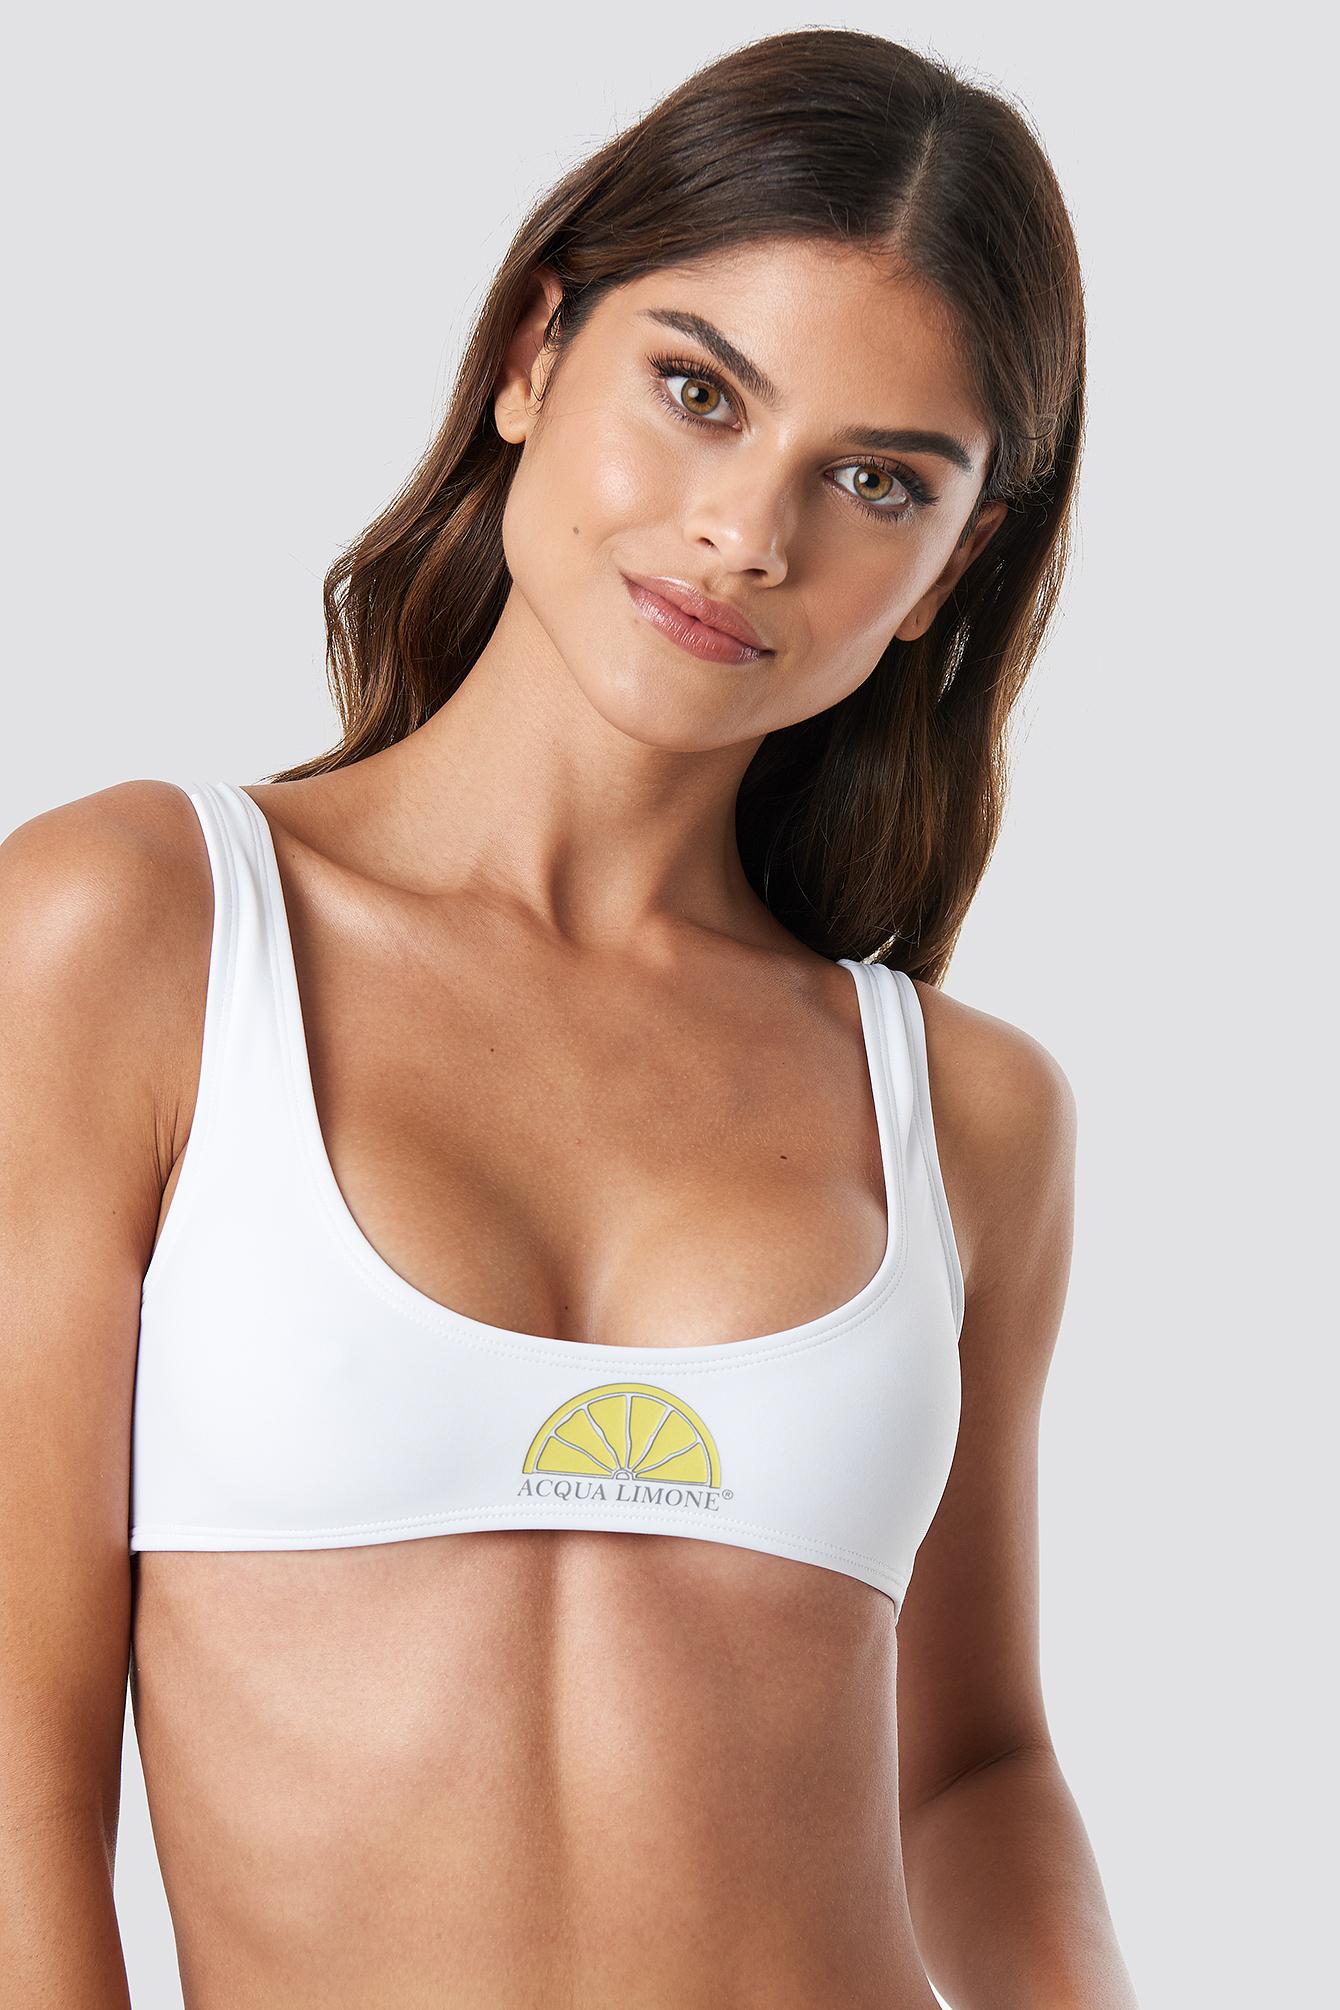 ACQUA LIMONE Juan Le Pins Bikini Top - White